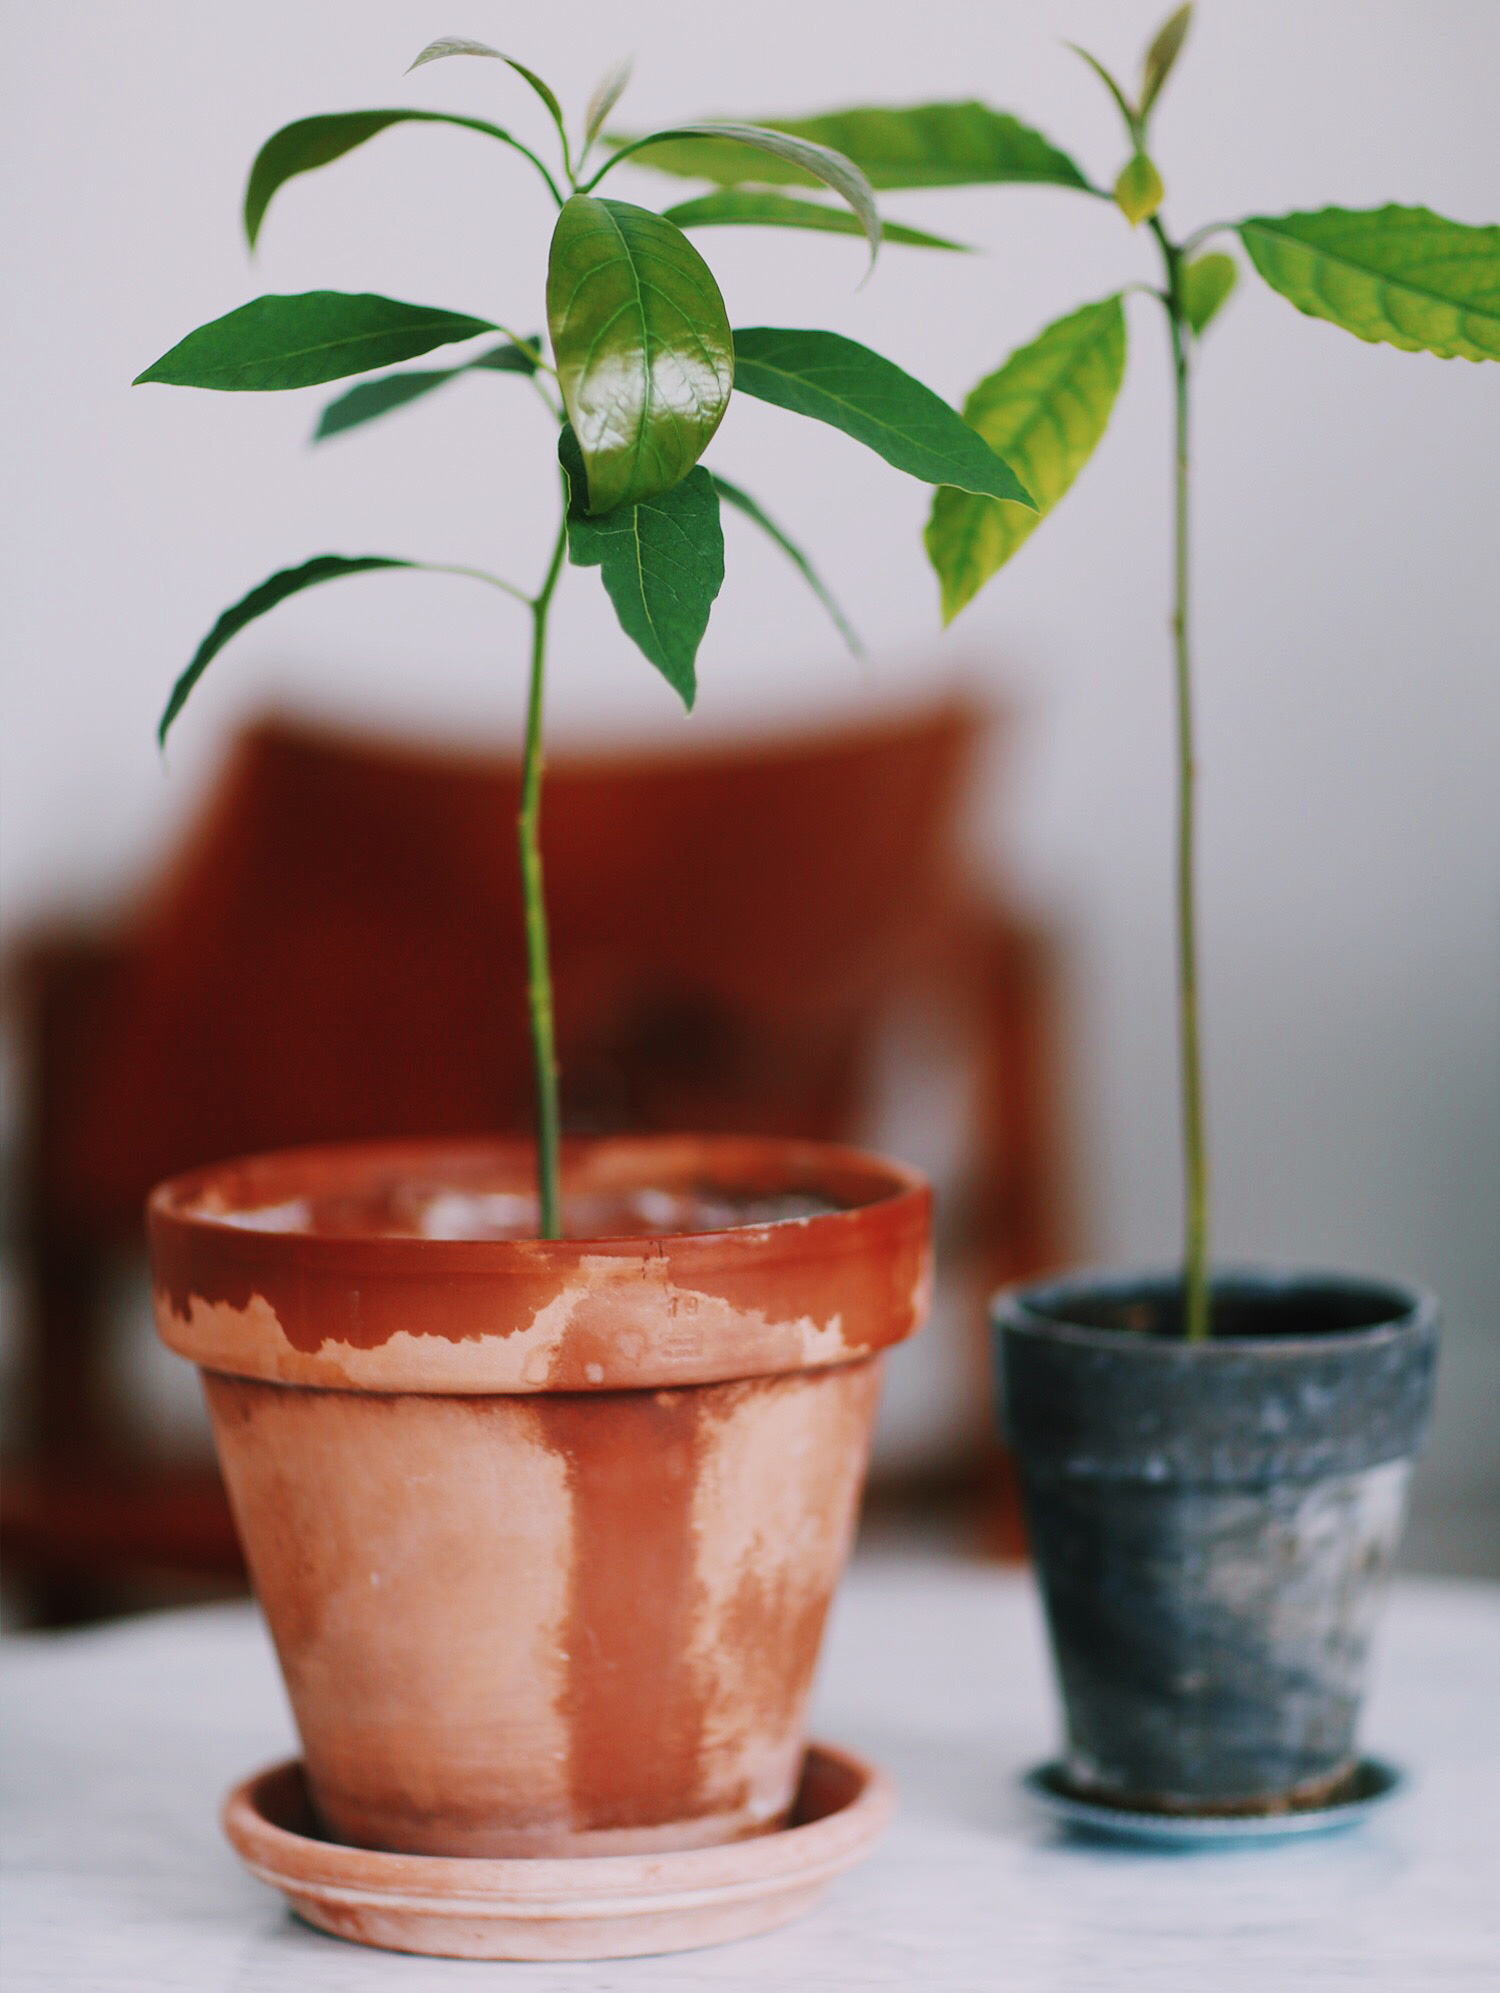 diy-avocado-træ